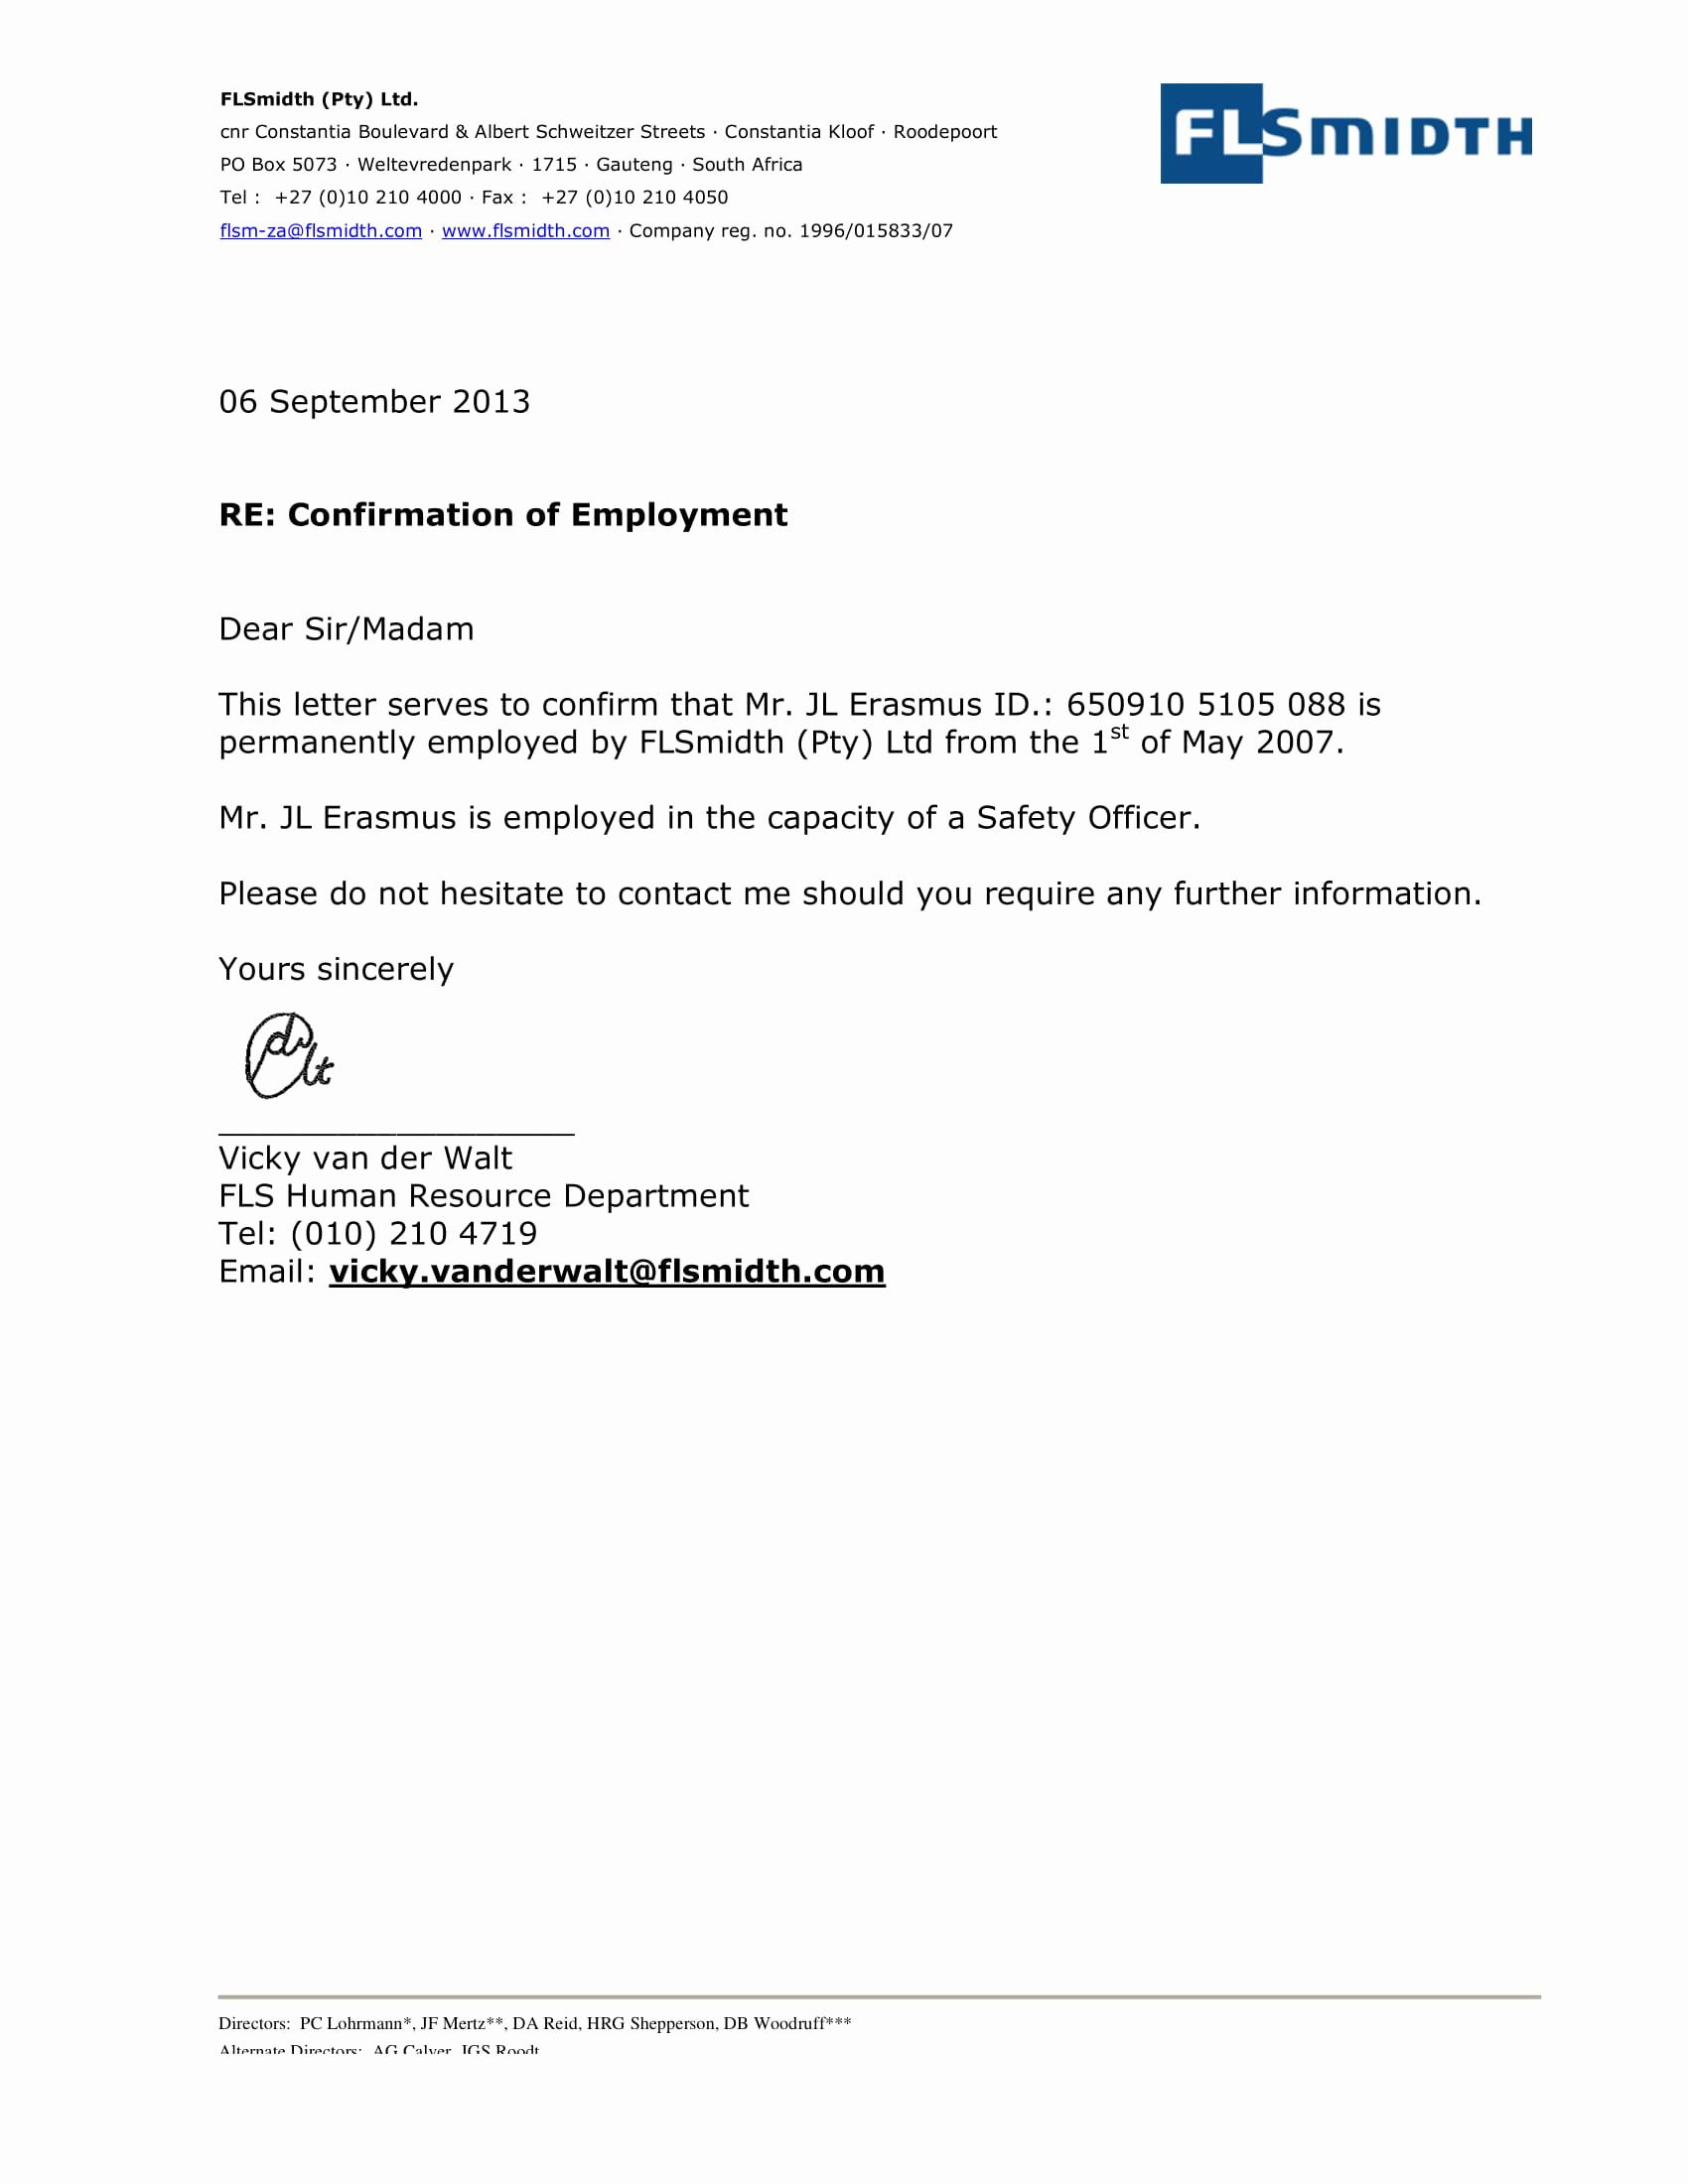 Employment Verification Letter Template Beautiful 29 Verification Letter Examples Pdf